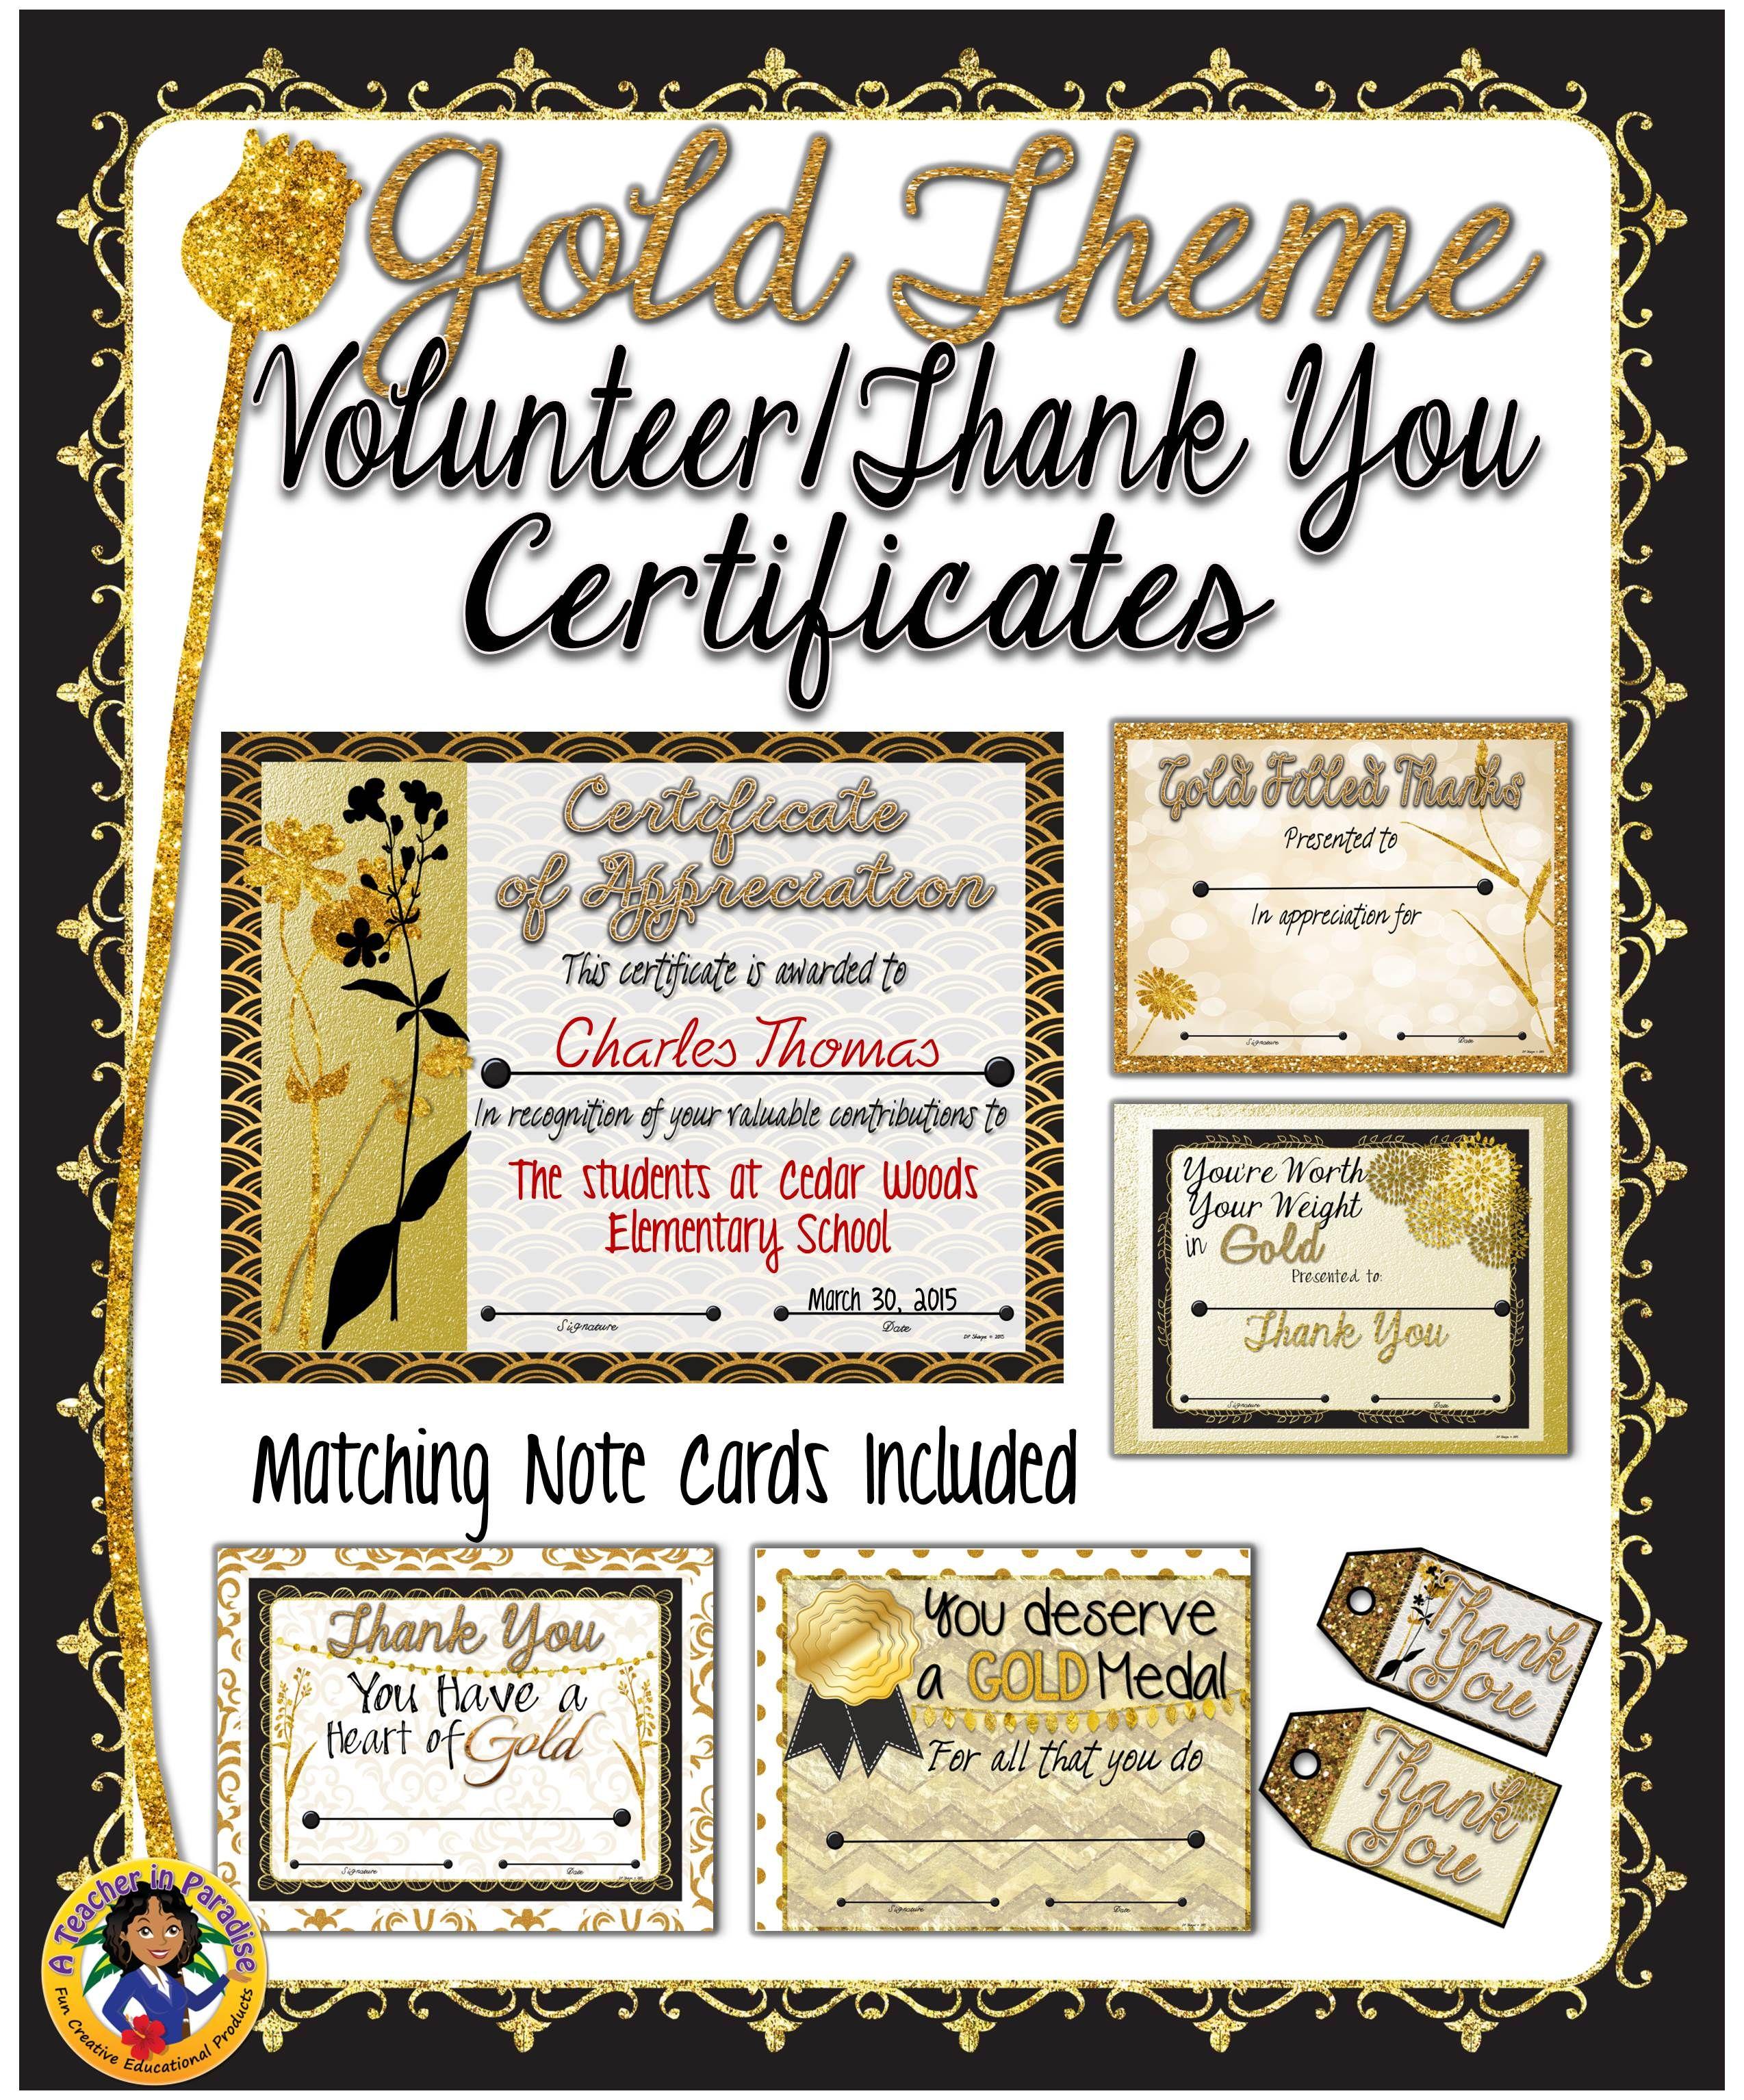 Volunteer Appreciation/Thank You Certificates {Gold Theme}   Pinterest